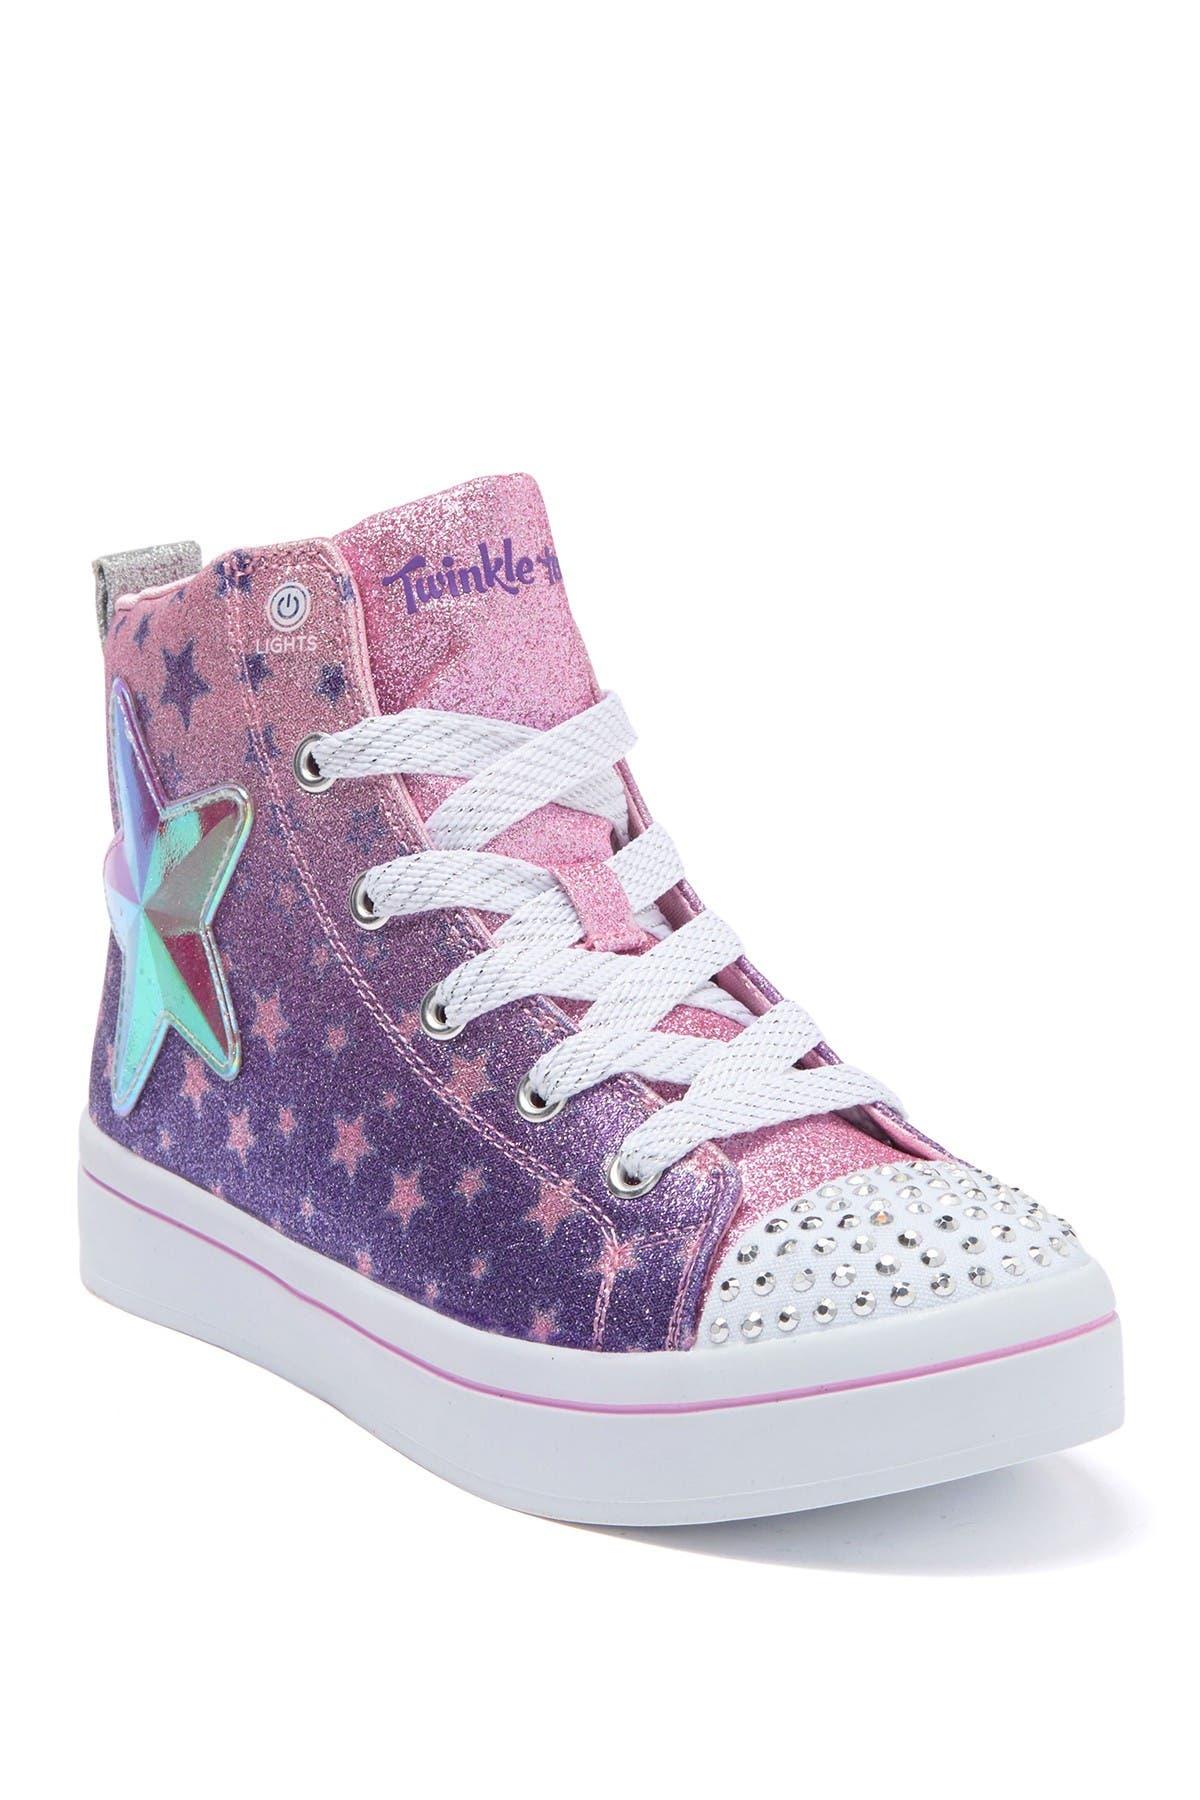 Image of Skechers Twi-Lites Starry Gem High Top Sneaker